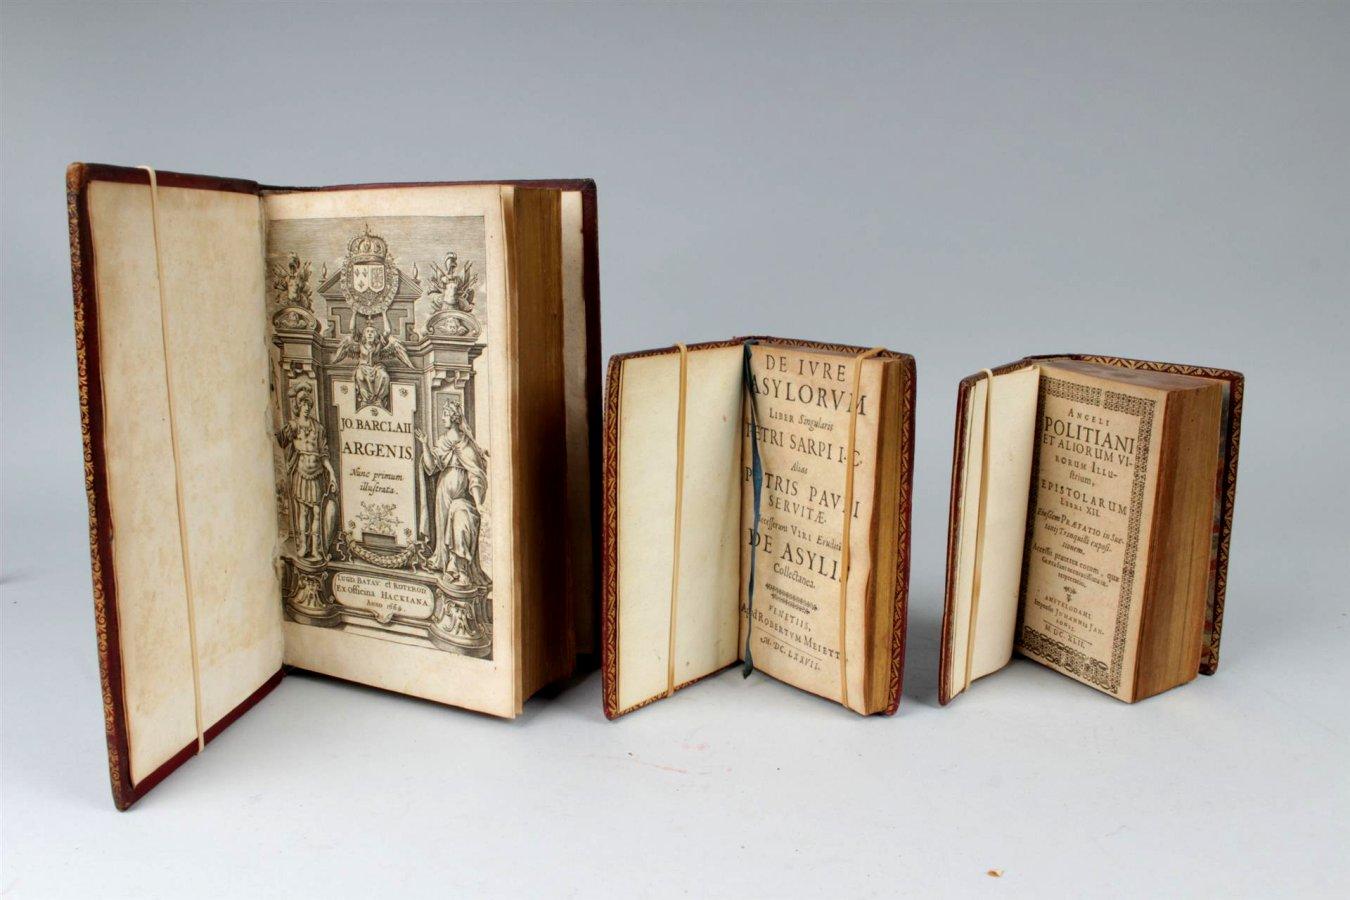 ensemble-de-trois-volumes-petri-sarpi-alias-patris-pavli-de-asylis-venise-1677-1-volume--17